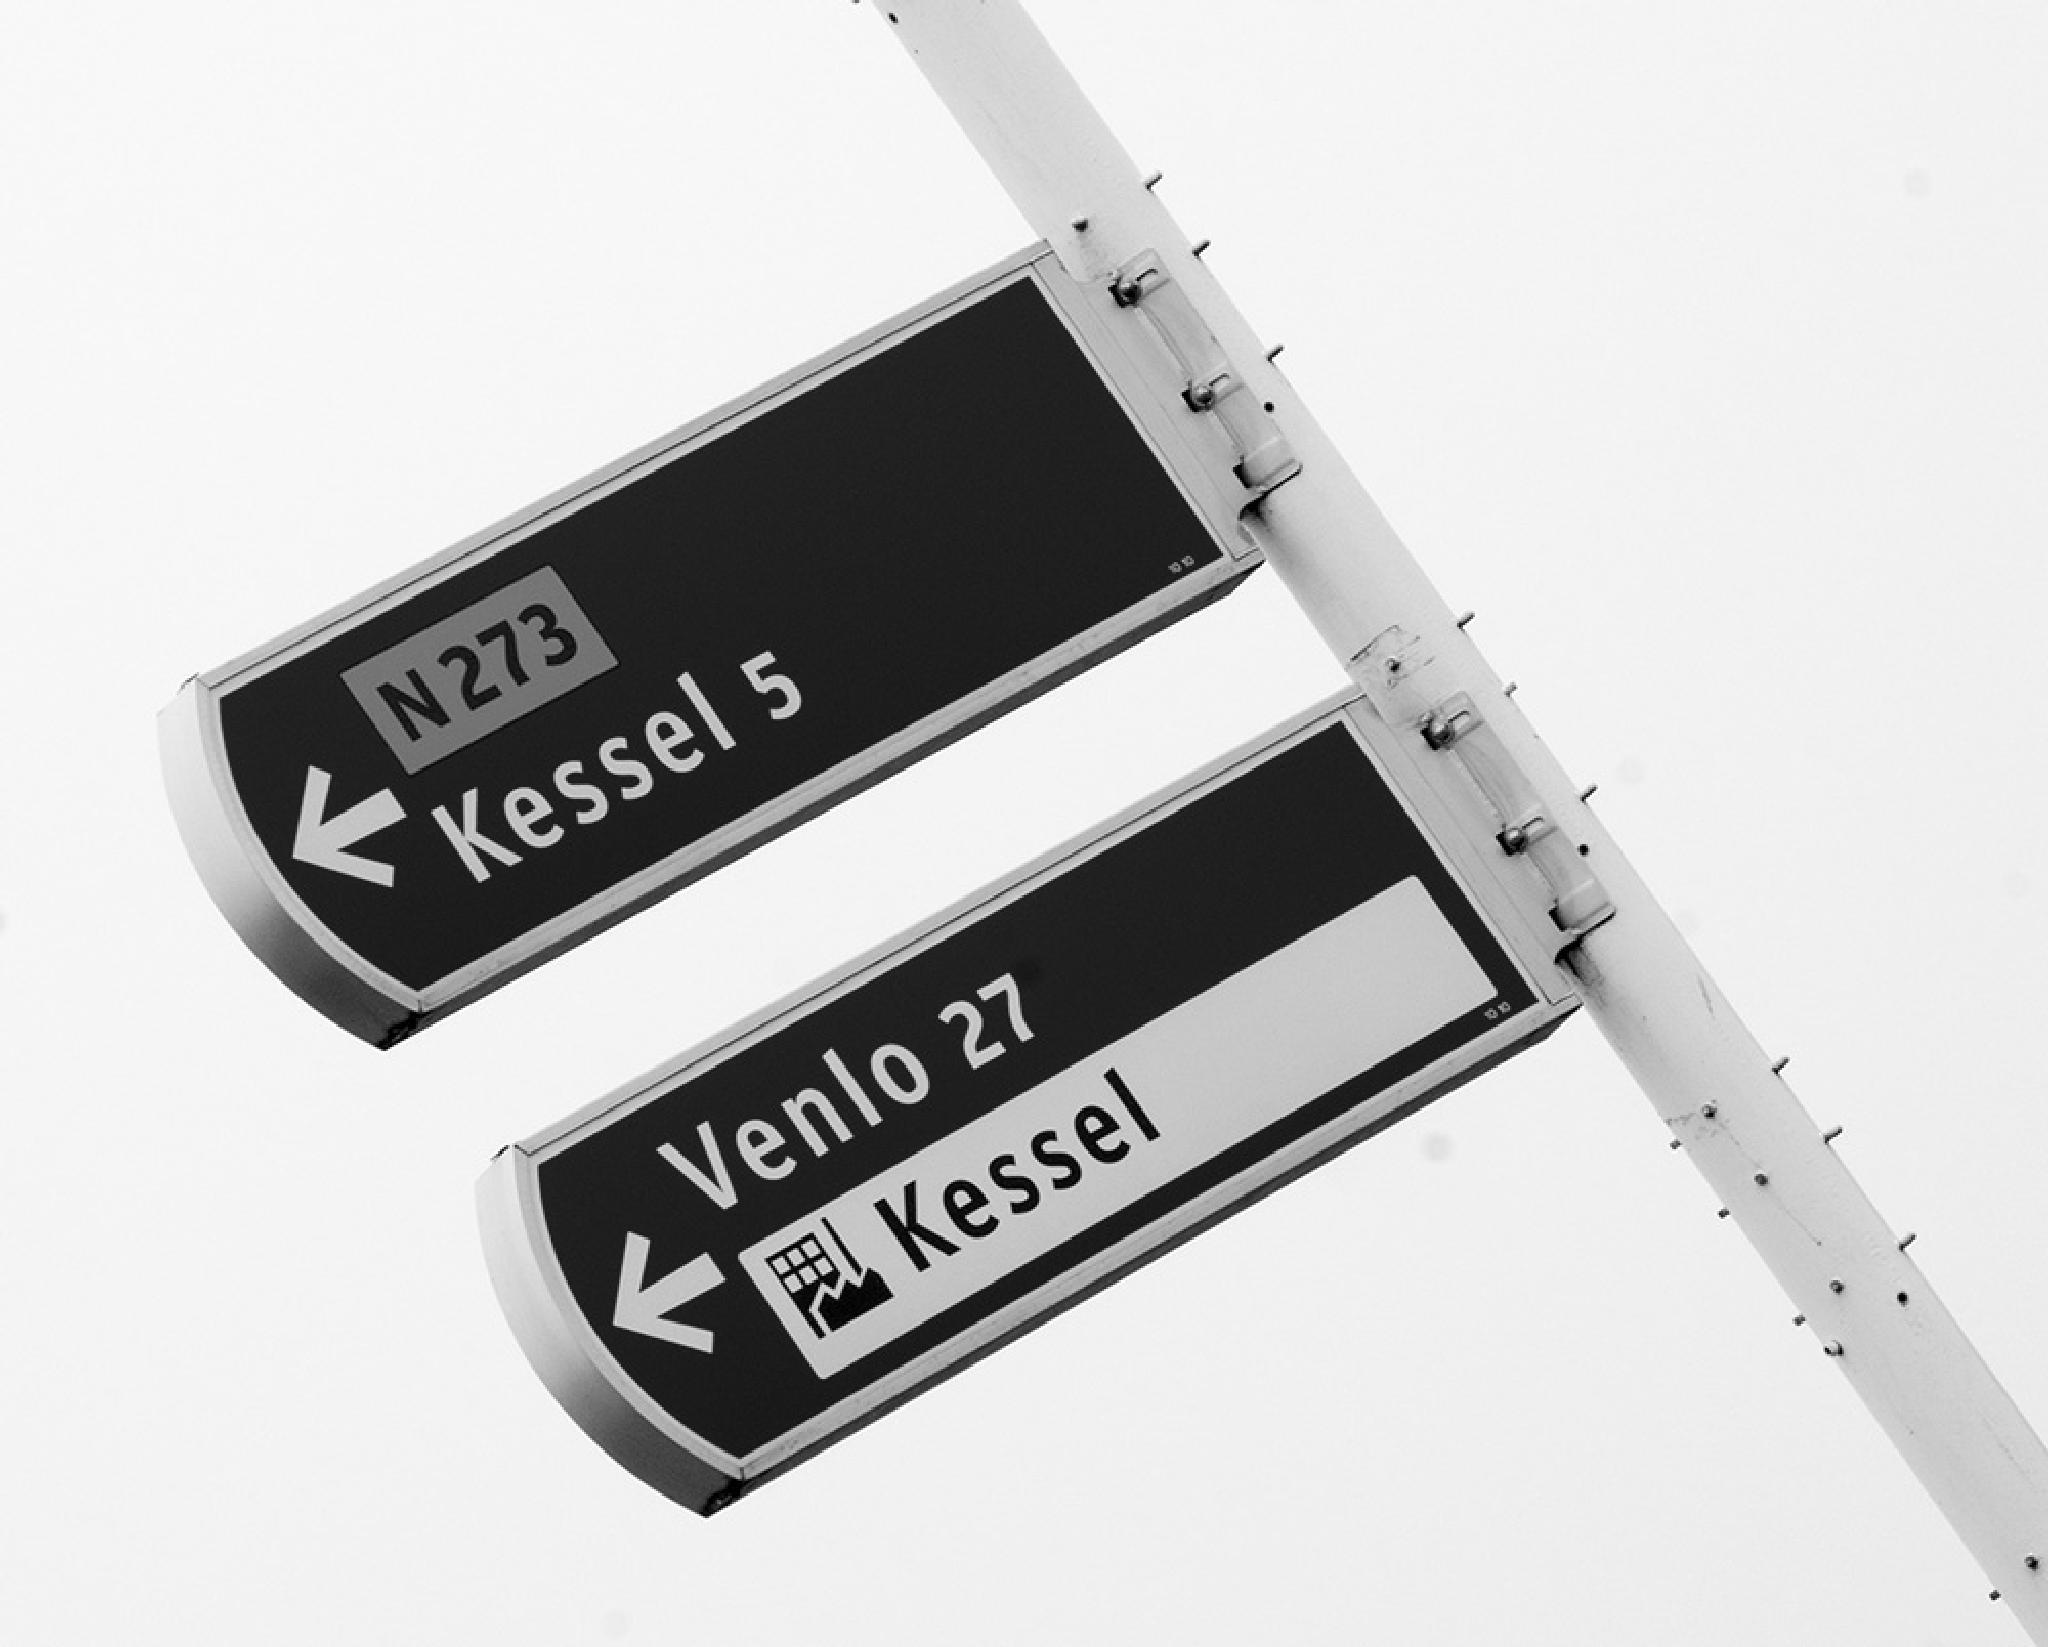 Kessel 5 by Rudy Stevens